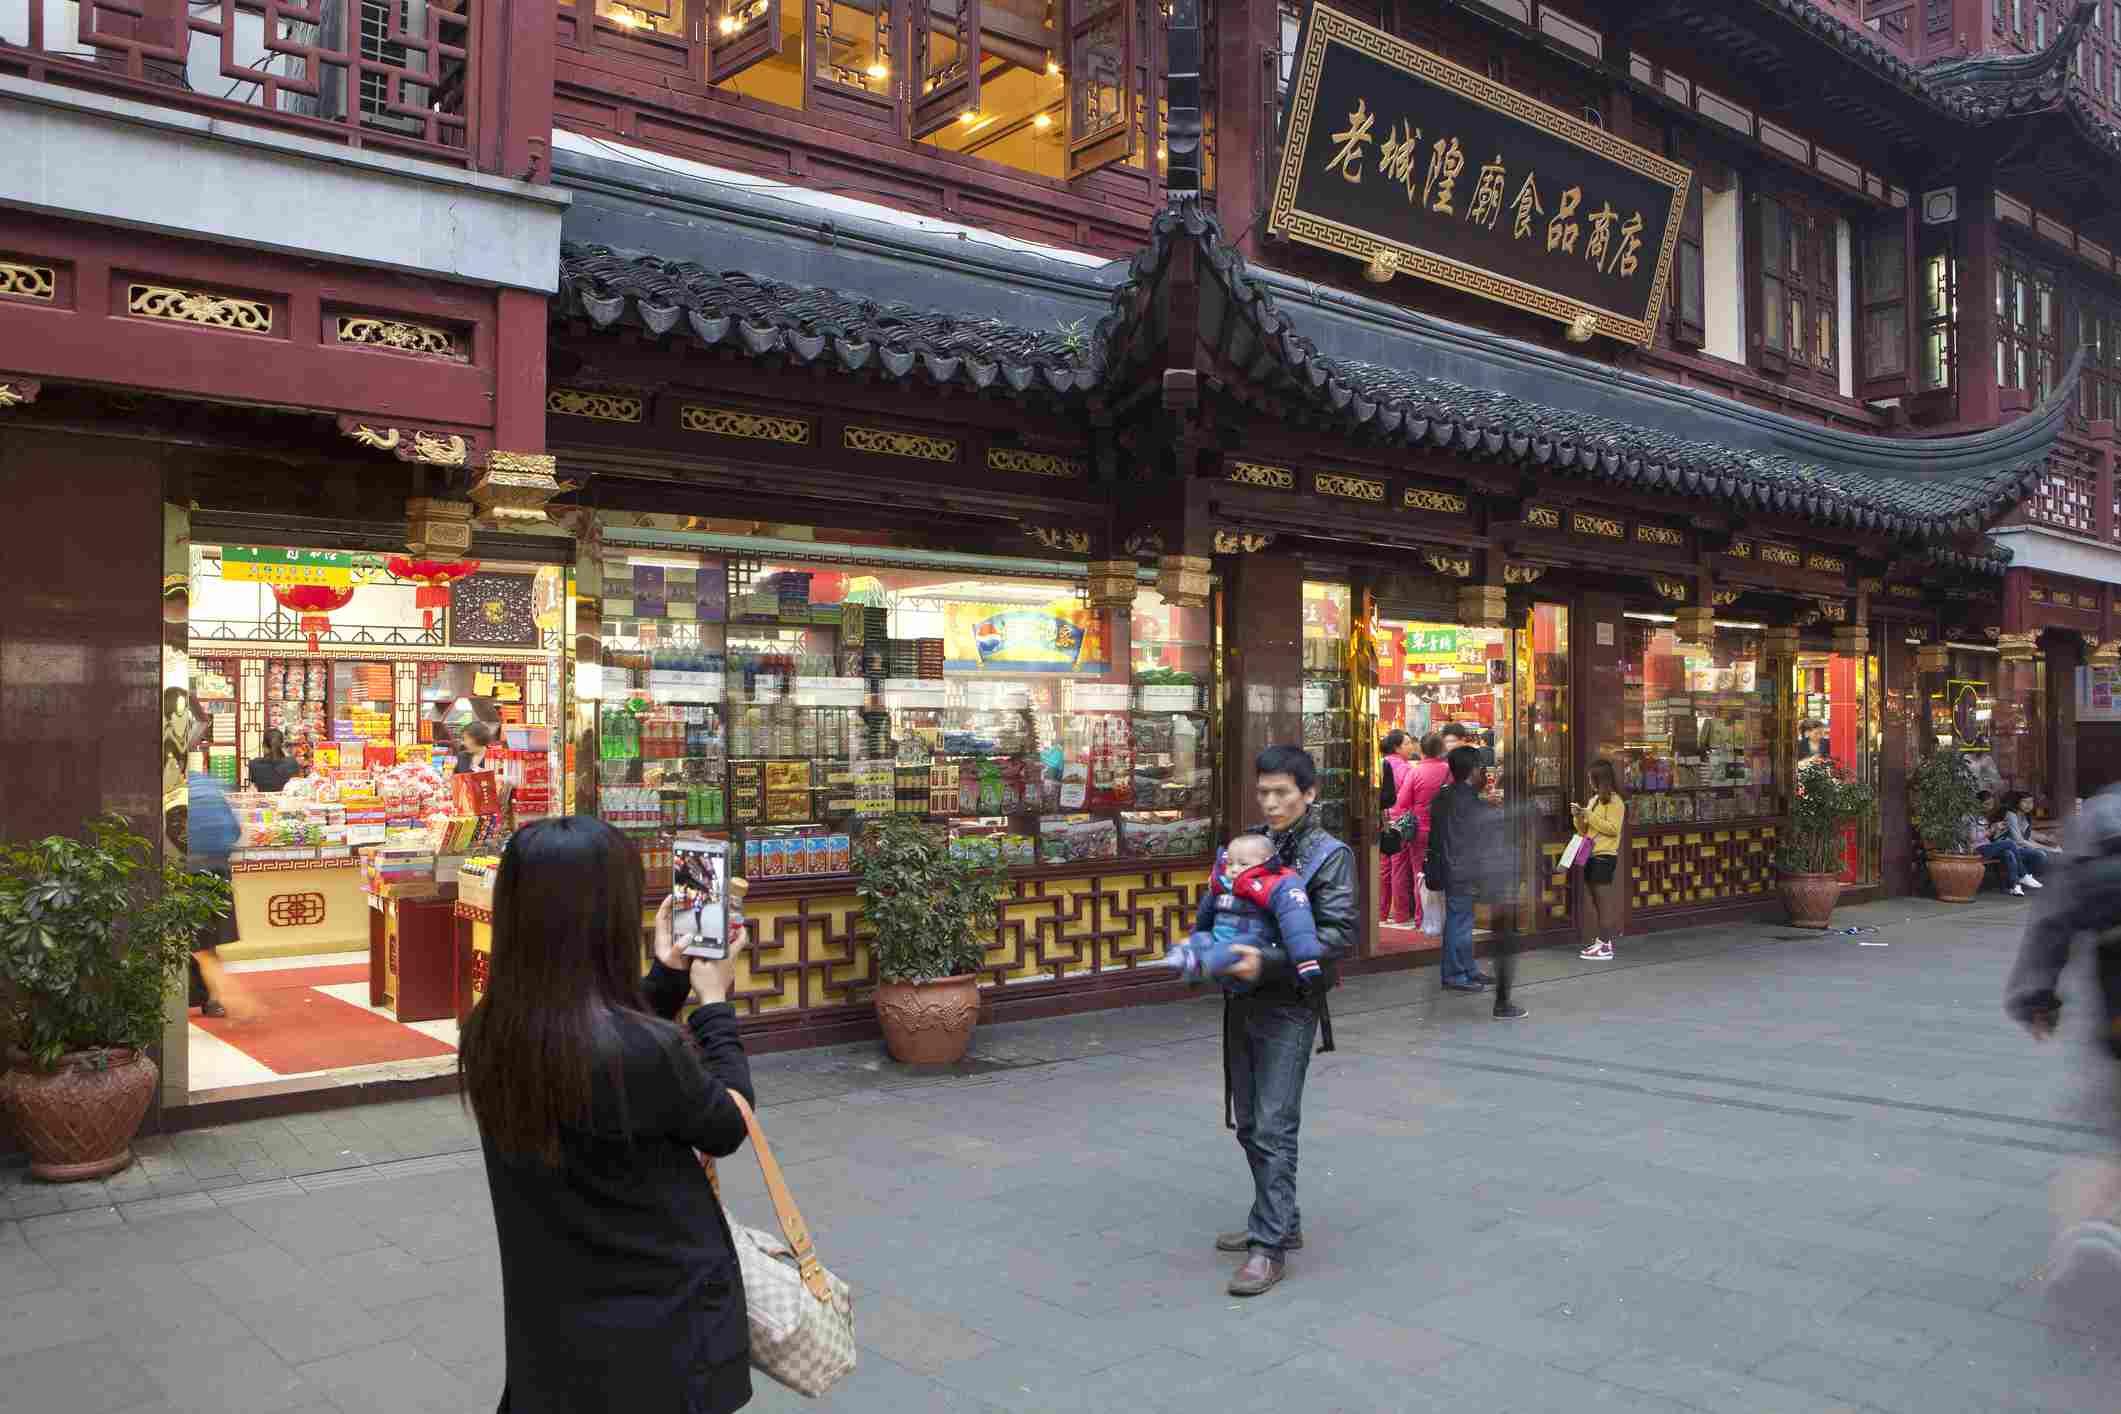 Yuyuan Garden and Bazaar